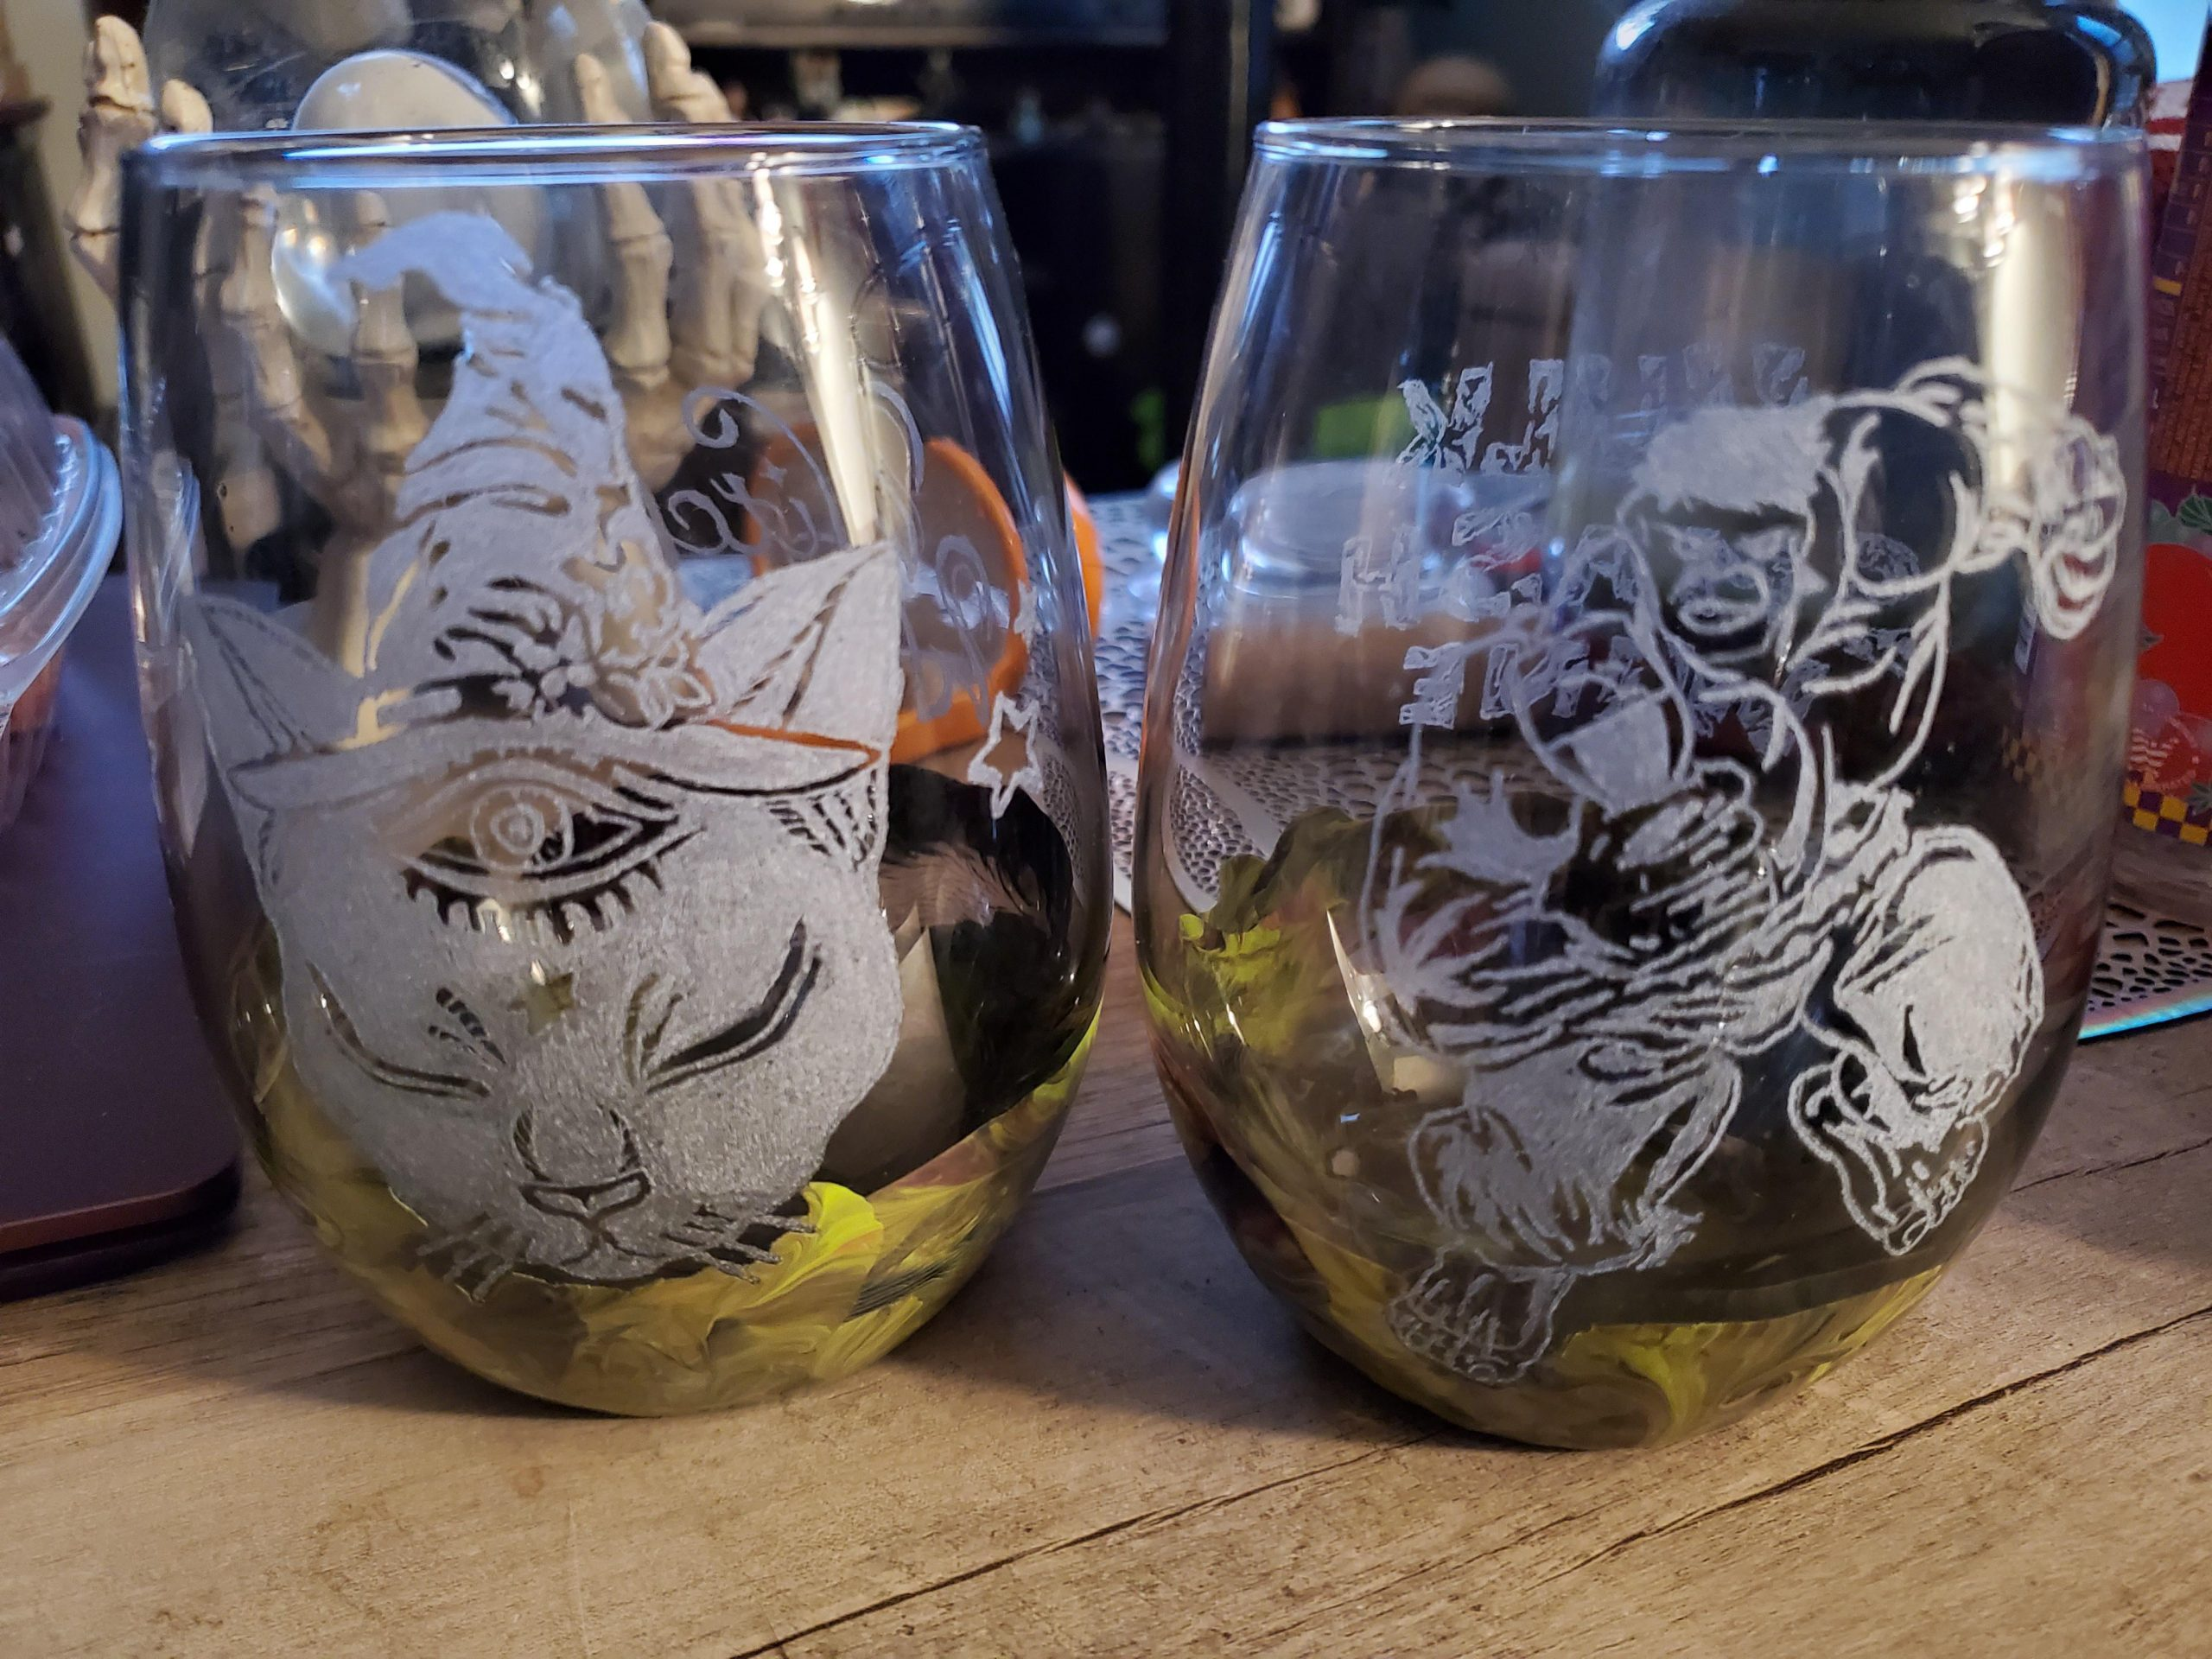 o12sxrvuu5o41 scaled - Etched glasses I made for my boyfriend and myself - hobbies, crafts